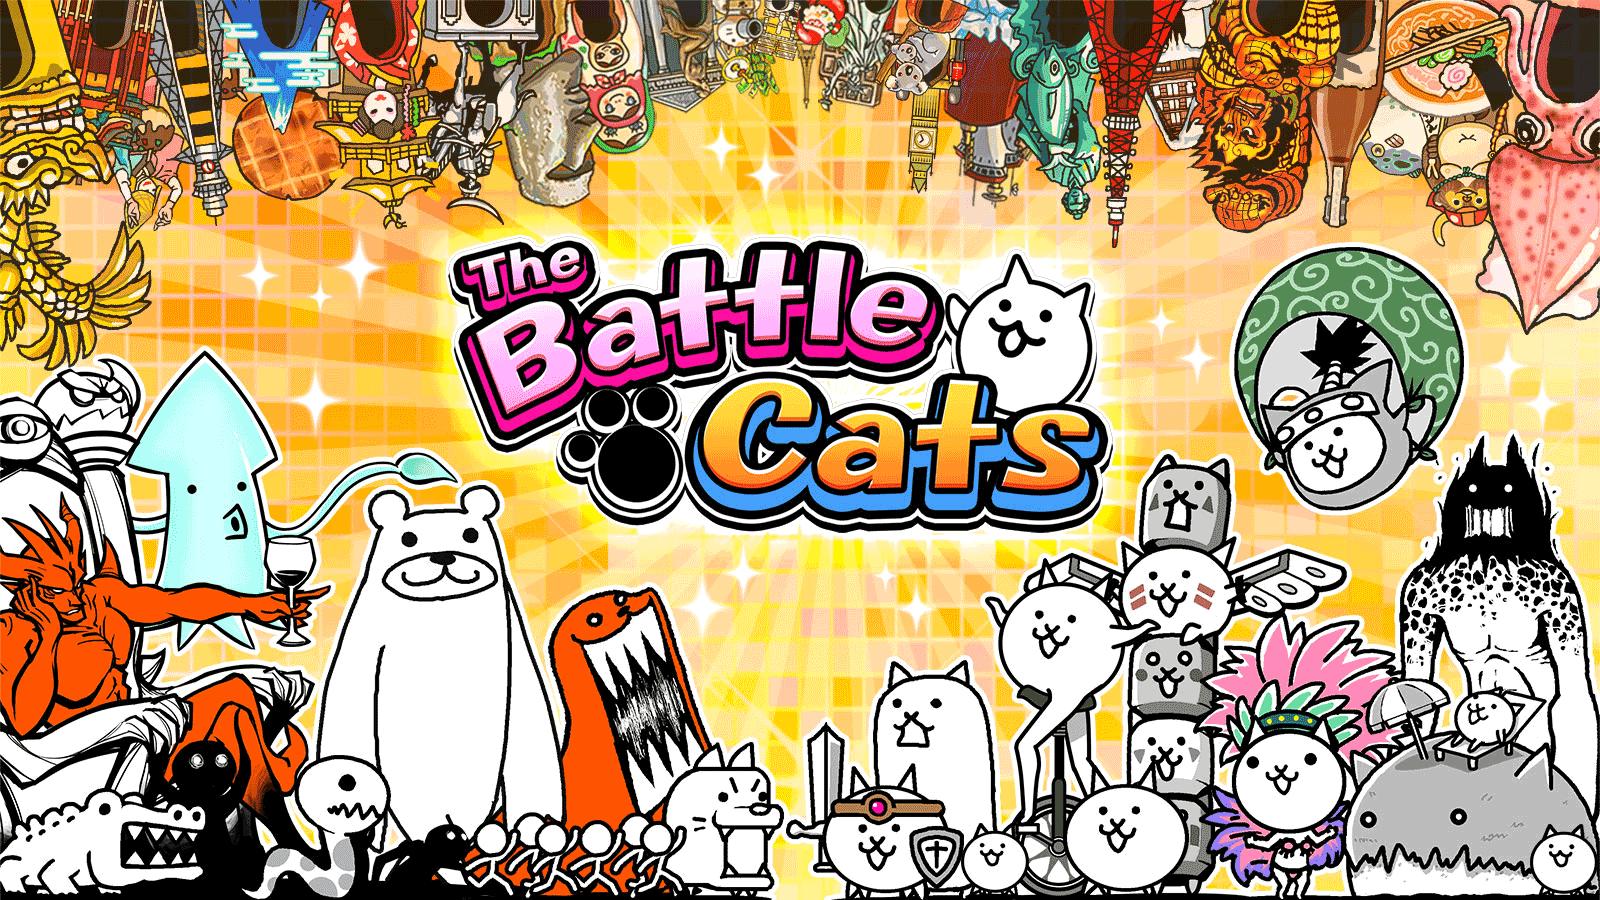 The Battle Cats | Battle Cats Wiki | FANDOM powered by Wikia